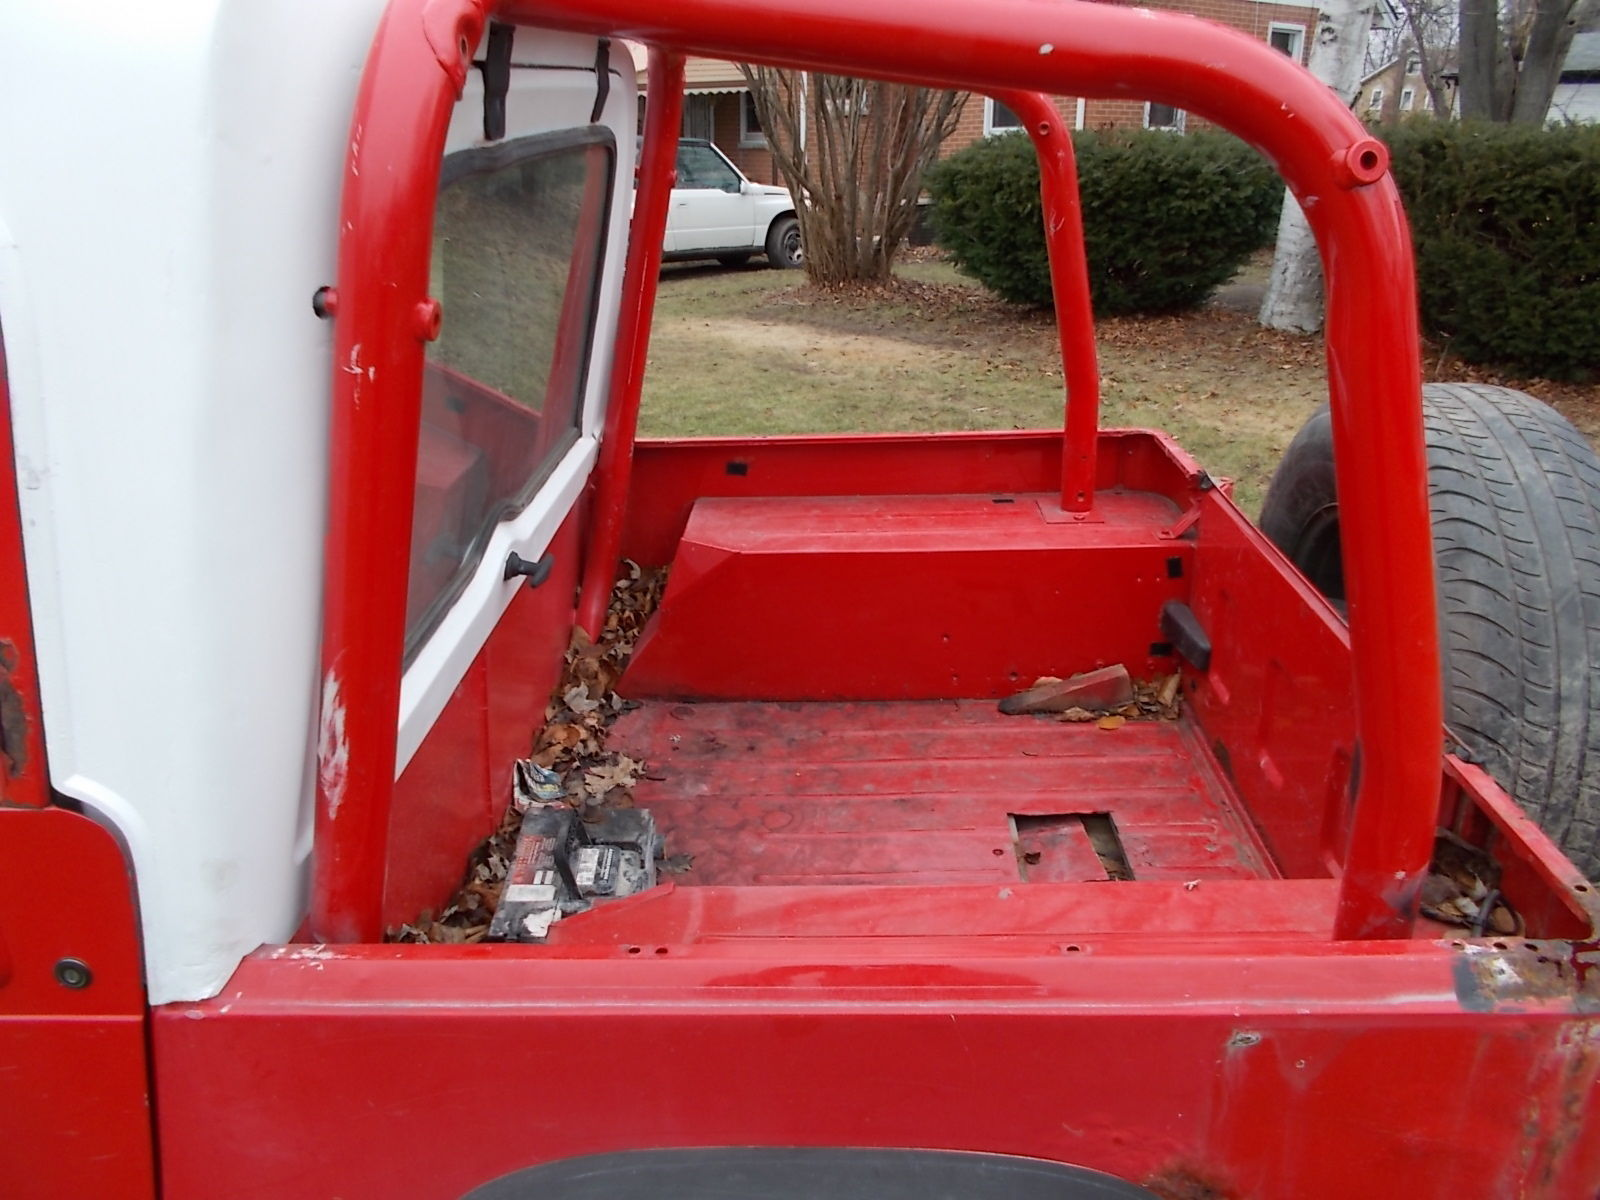 1994 Jeep Wrangler Yj Half Hardtop 2 5 Amc 5 Speed Tranny 4x4 Weber